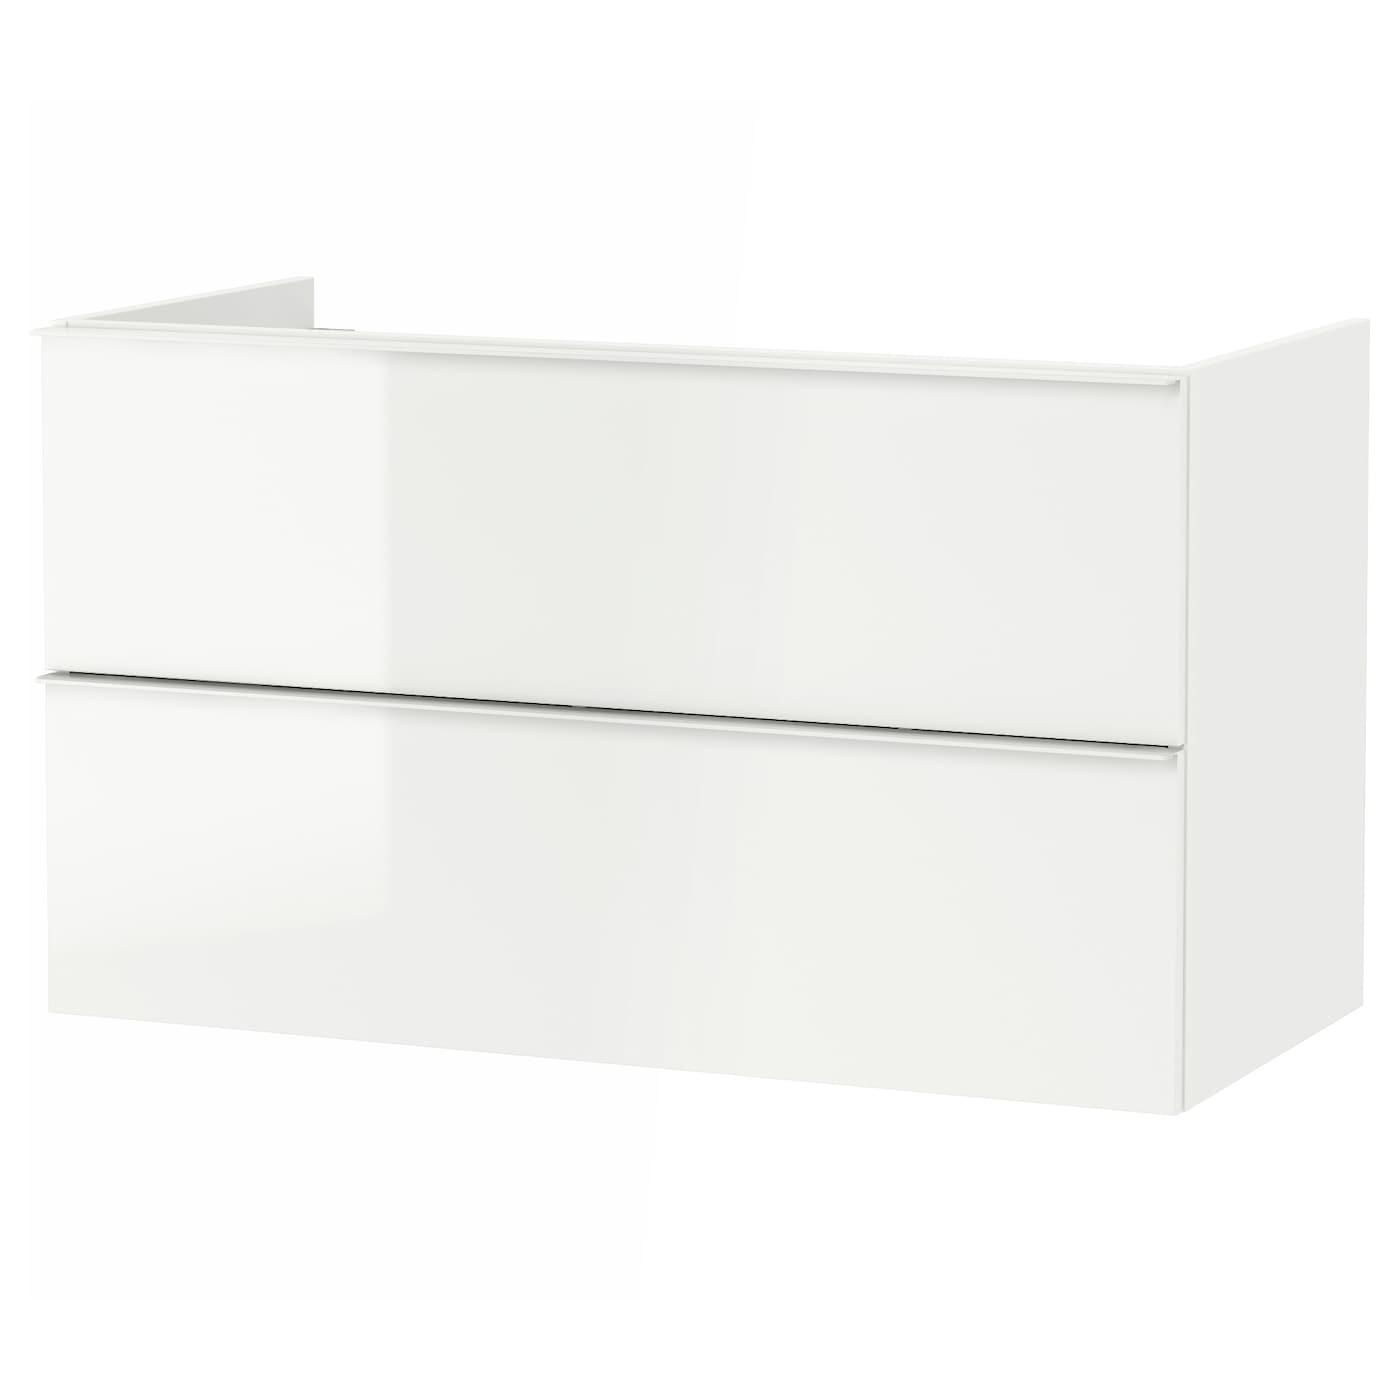 godmorgon meuble lavabo 2tir brillant blanc 100x47x58 cm. Black Bedroom Furniture Sets. Home Design Ideas